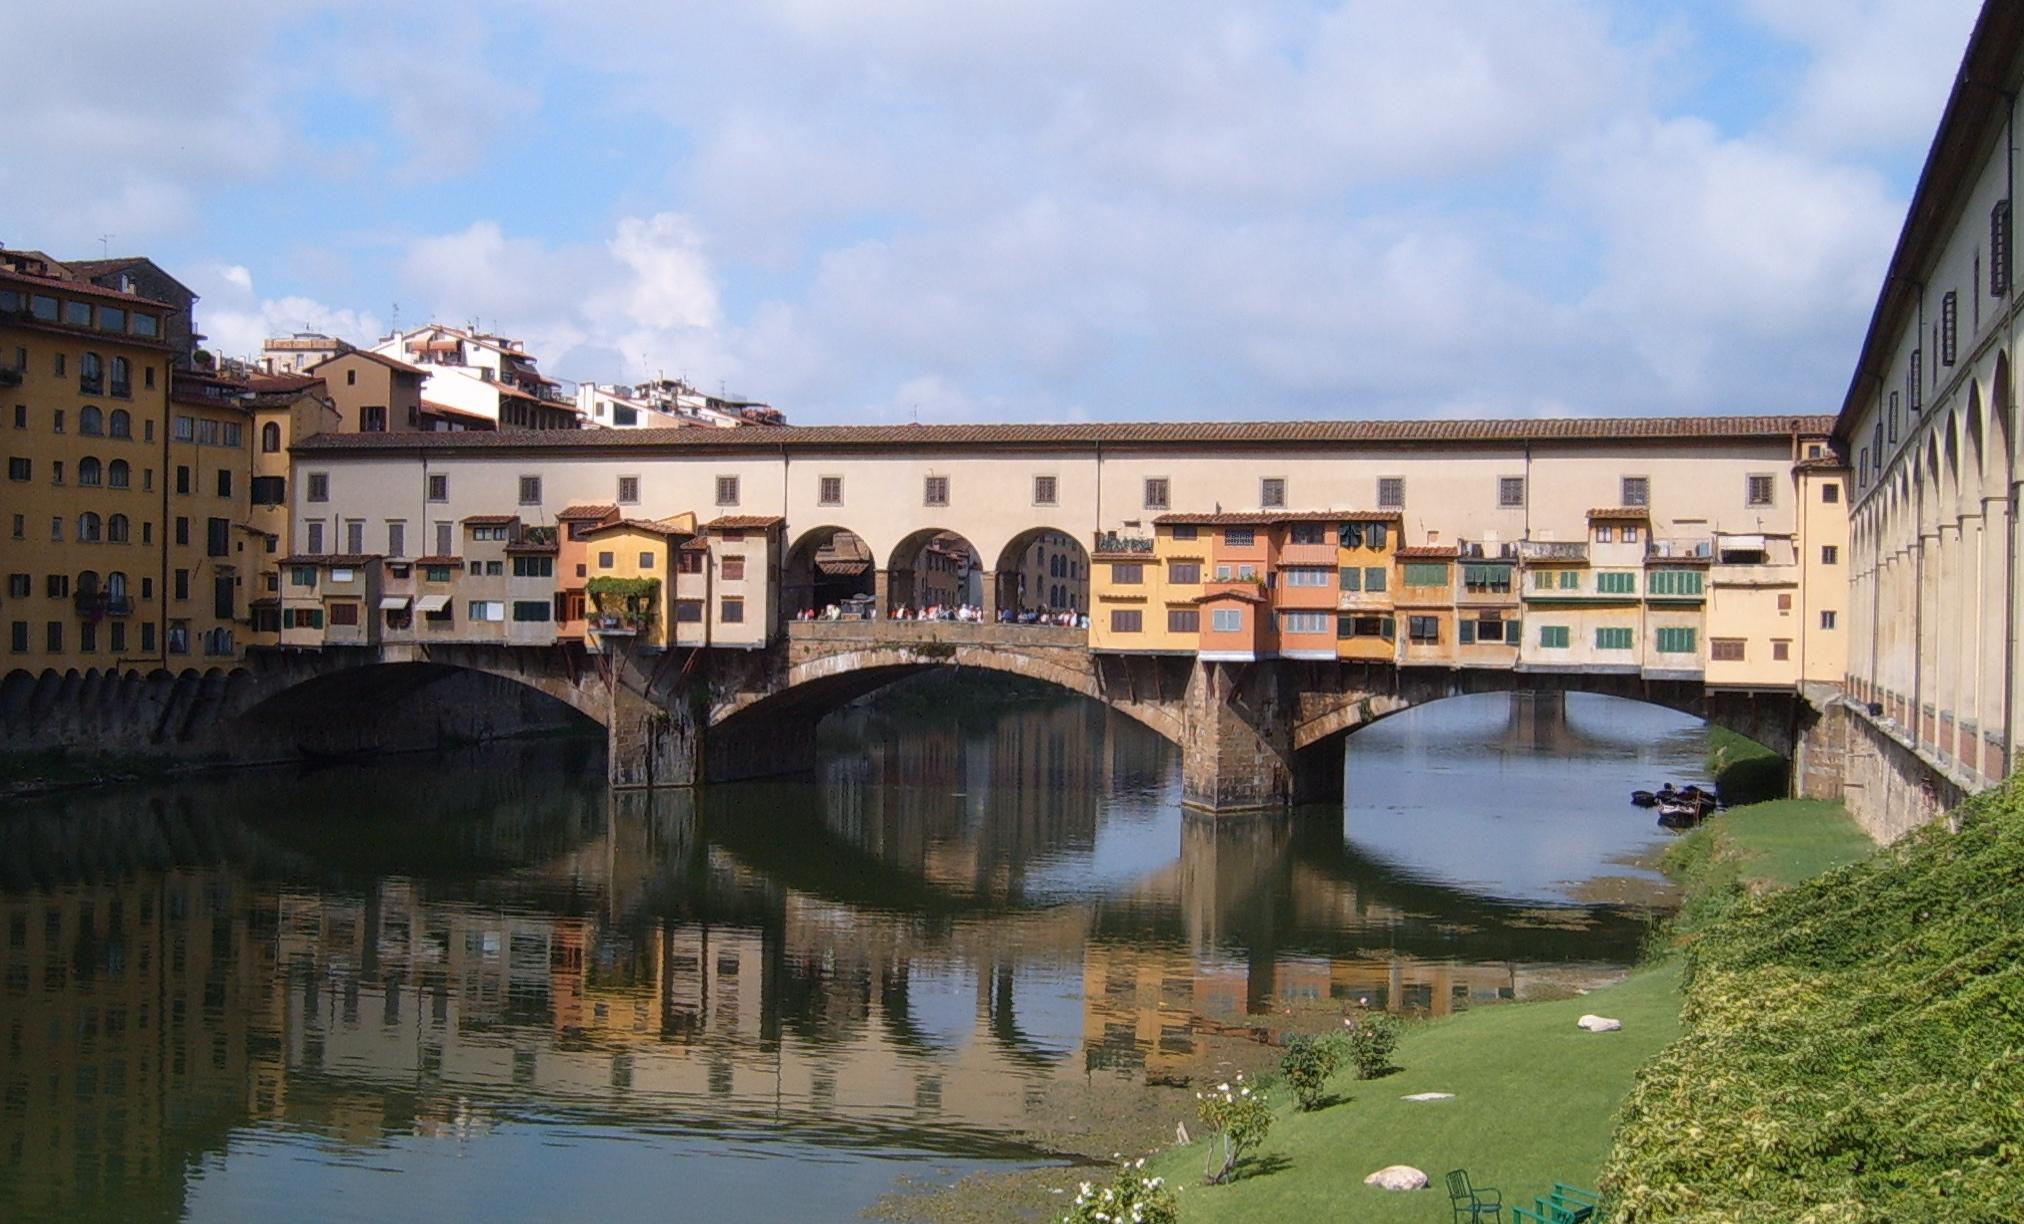 http://upload.wikimedia.org/wikipedia/commons/1/1b/Ponte_Vecchio_Firenze.jpg